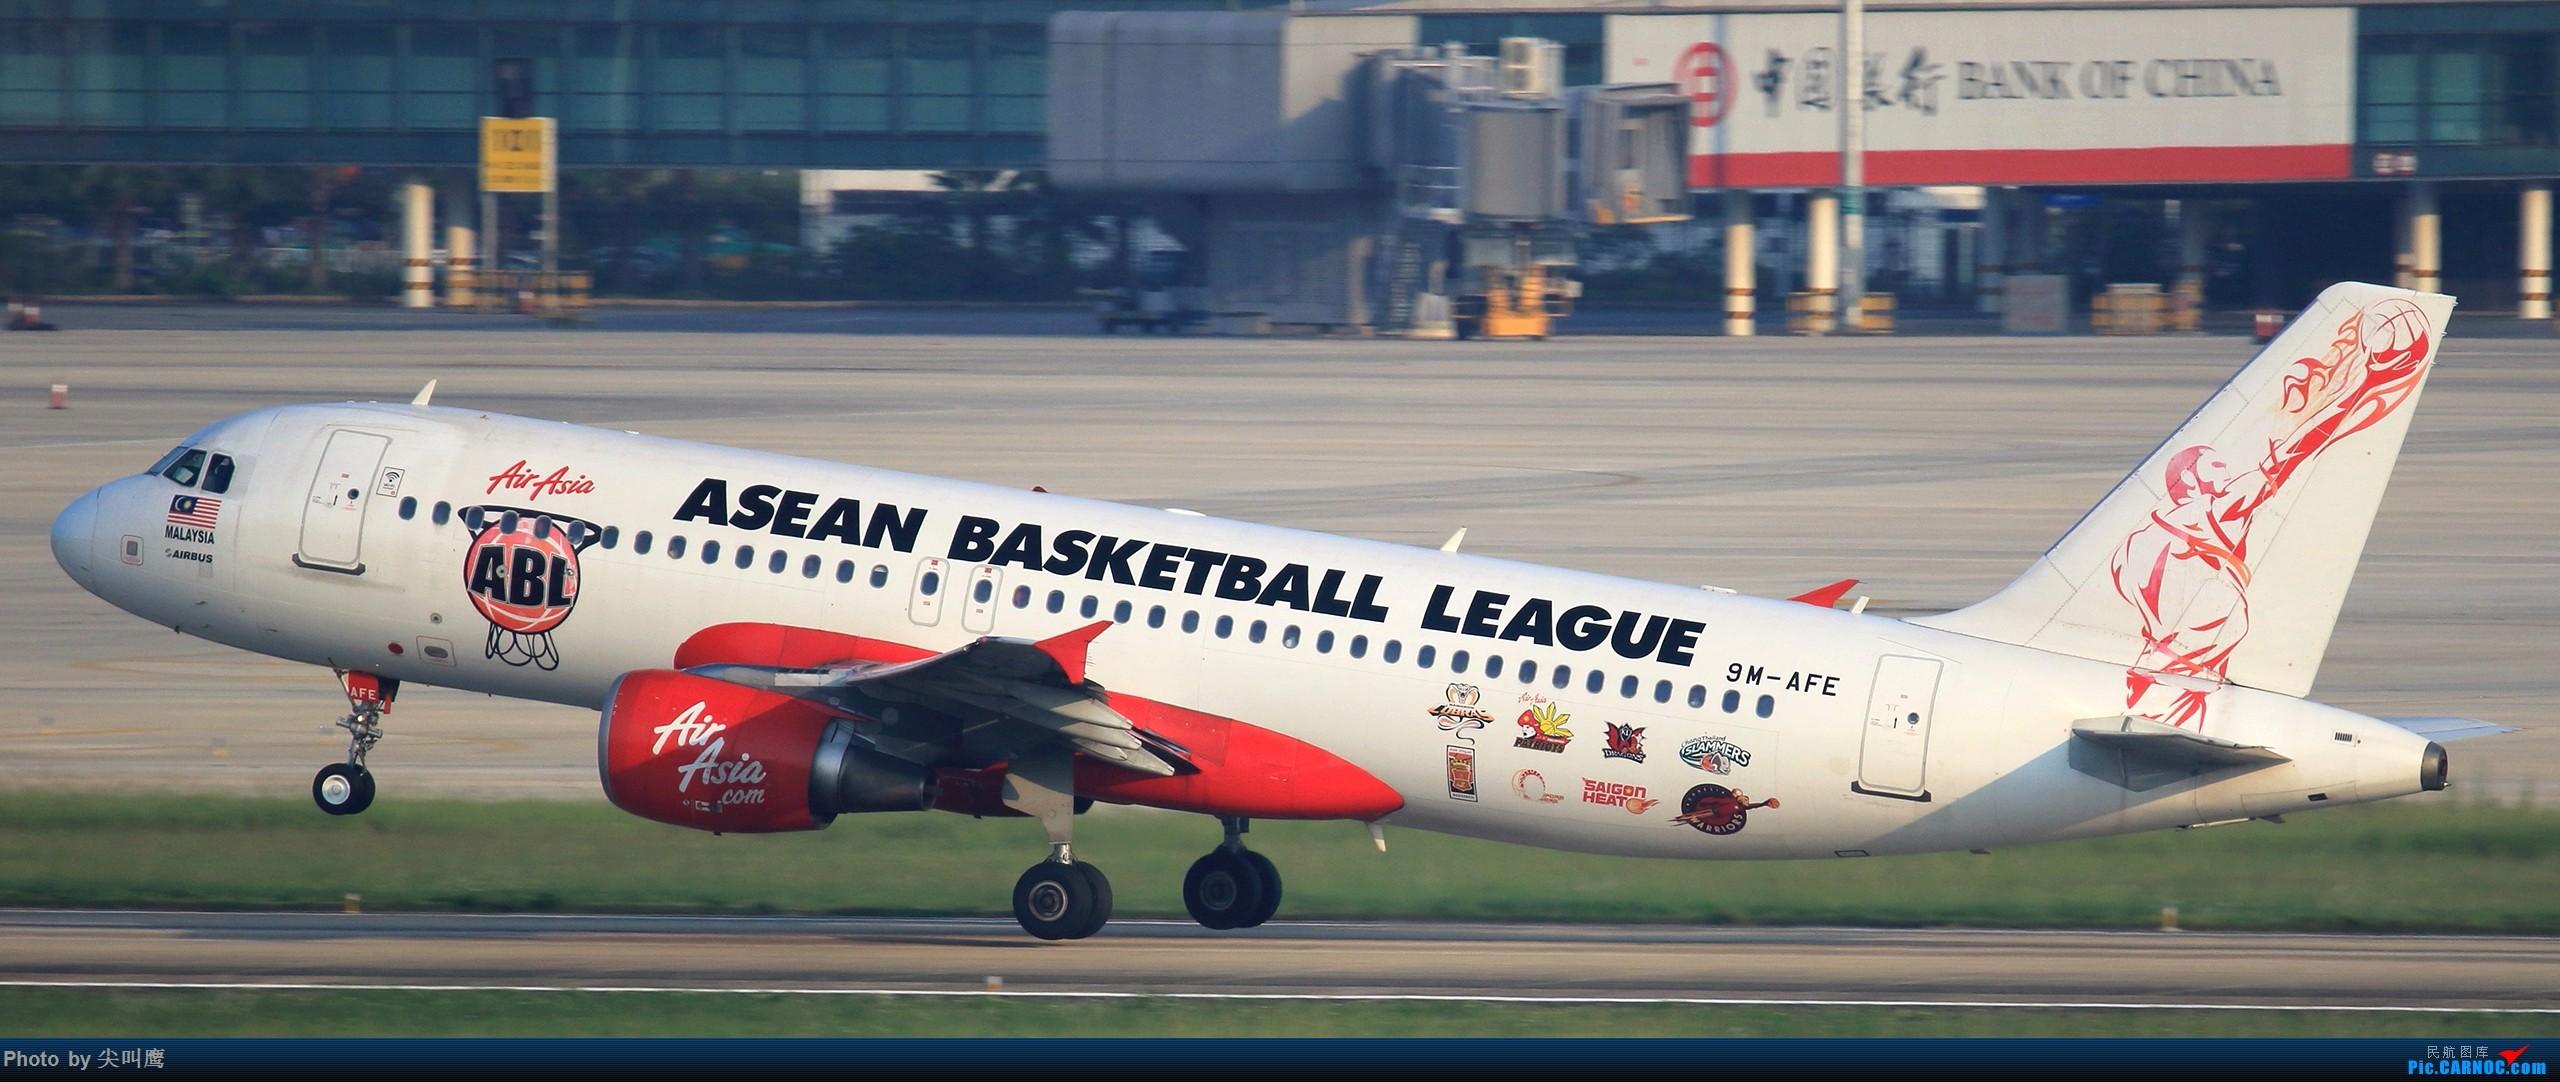 Re:[原创]NNG的亚航小合集 AIRBUS A320 9M-AFE 中国南宁吴圩国际机场